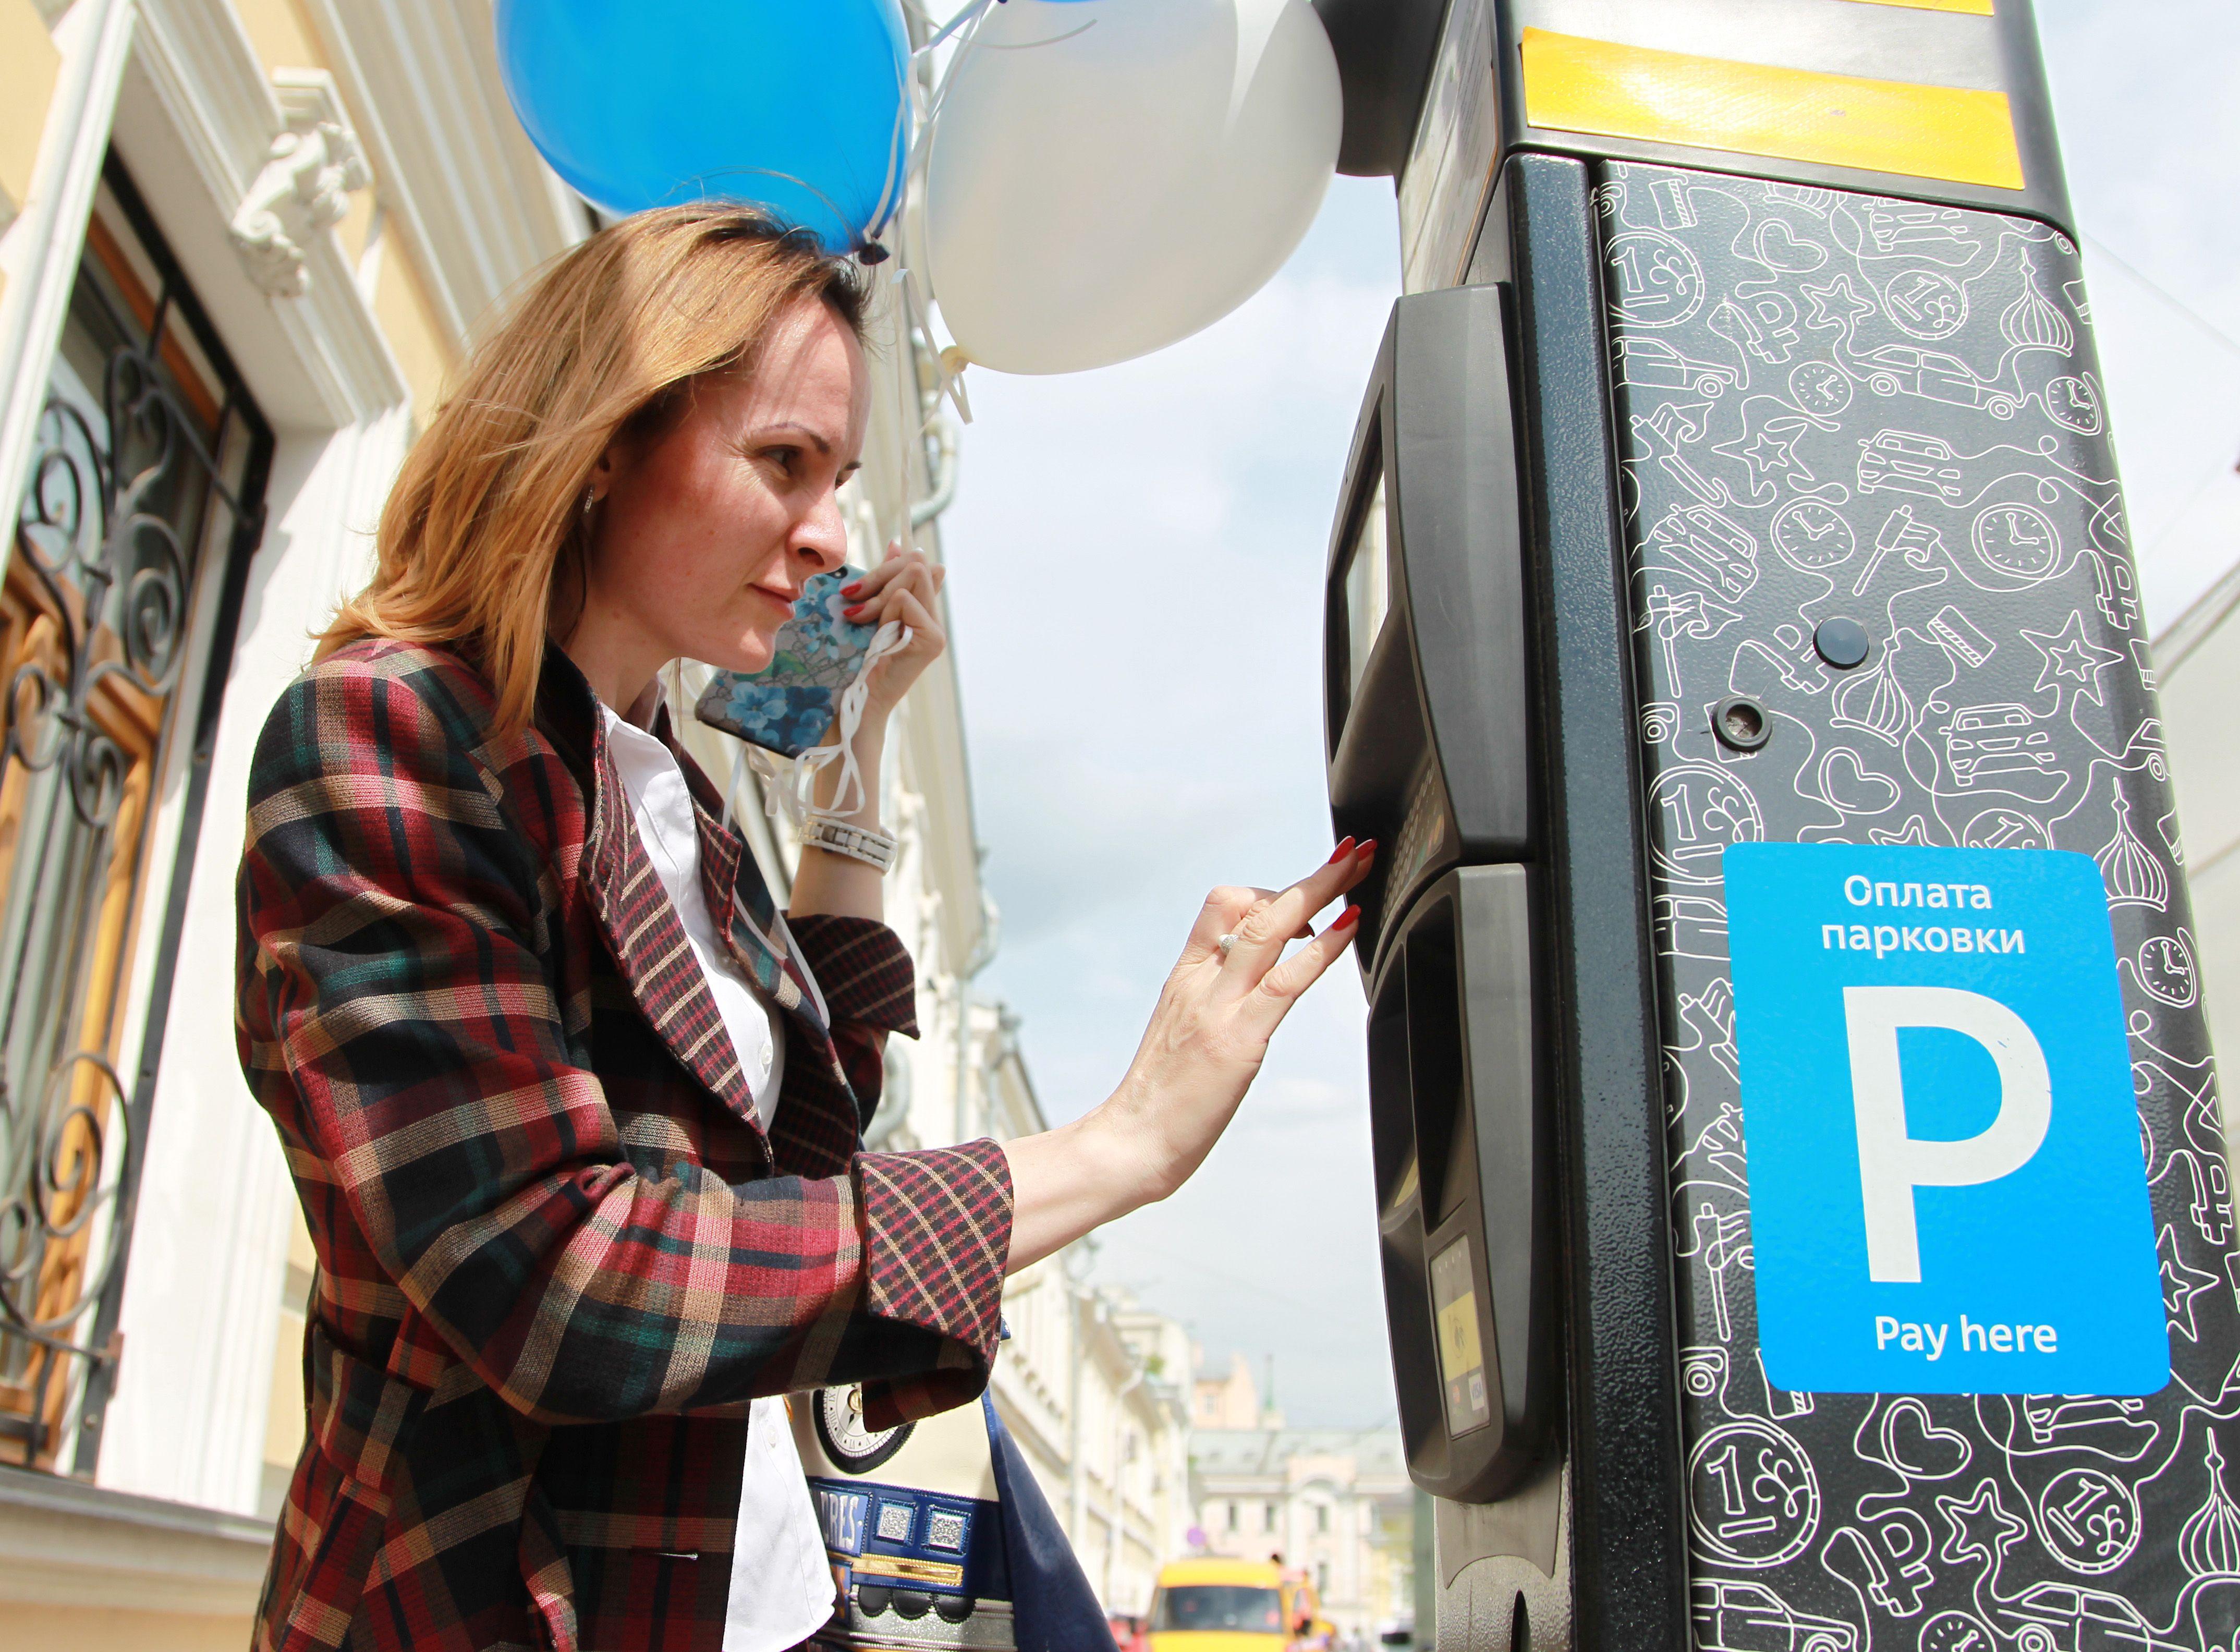 Москвичам дали время исправить ошибки при оплате парковки